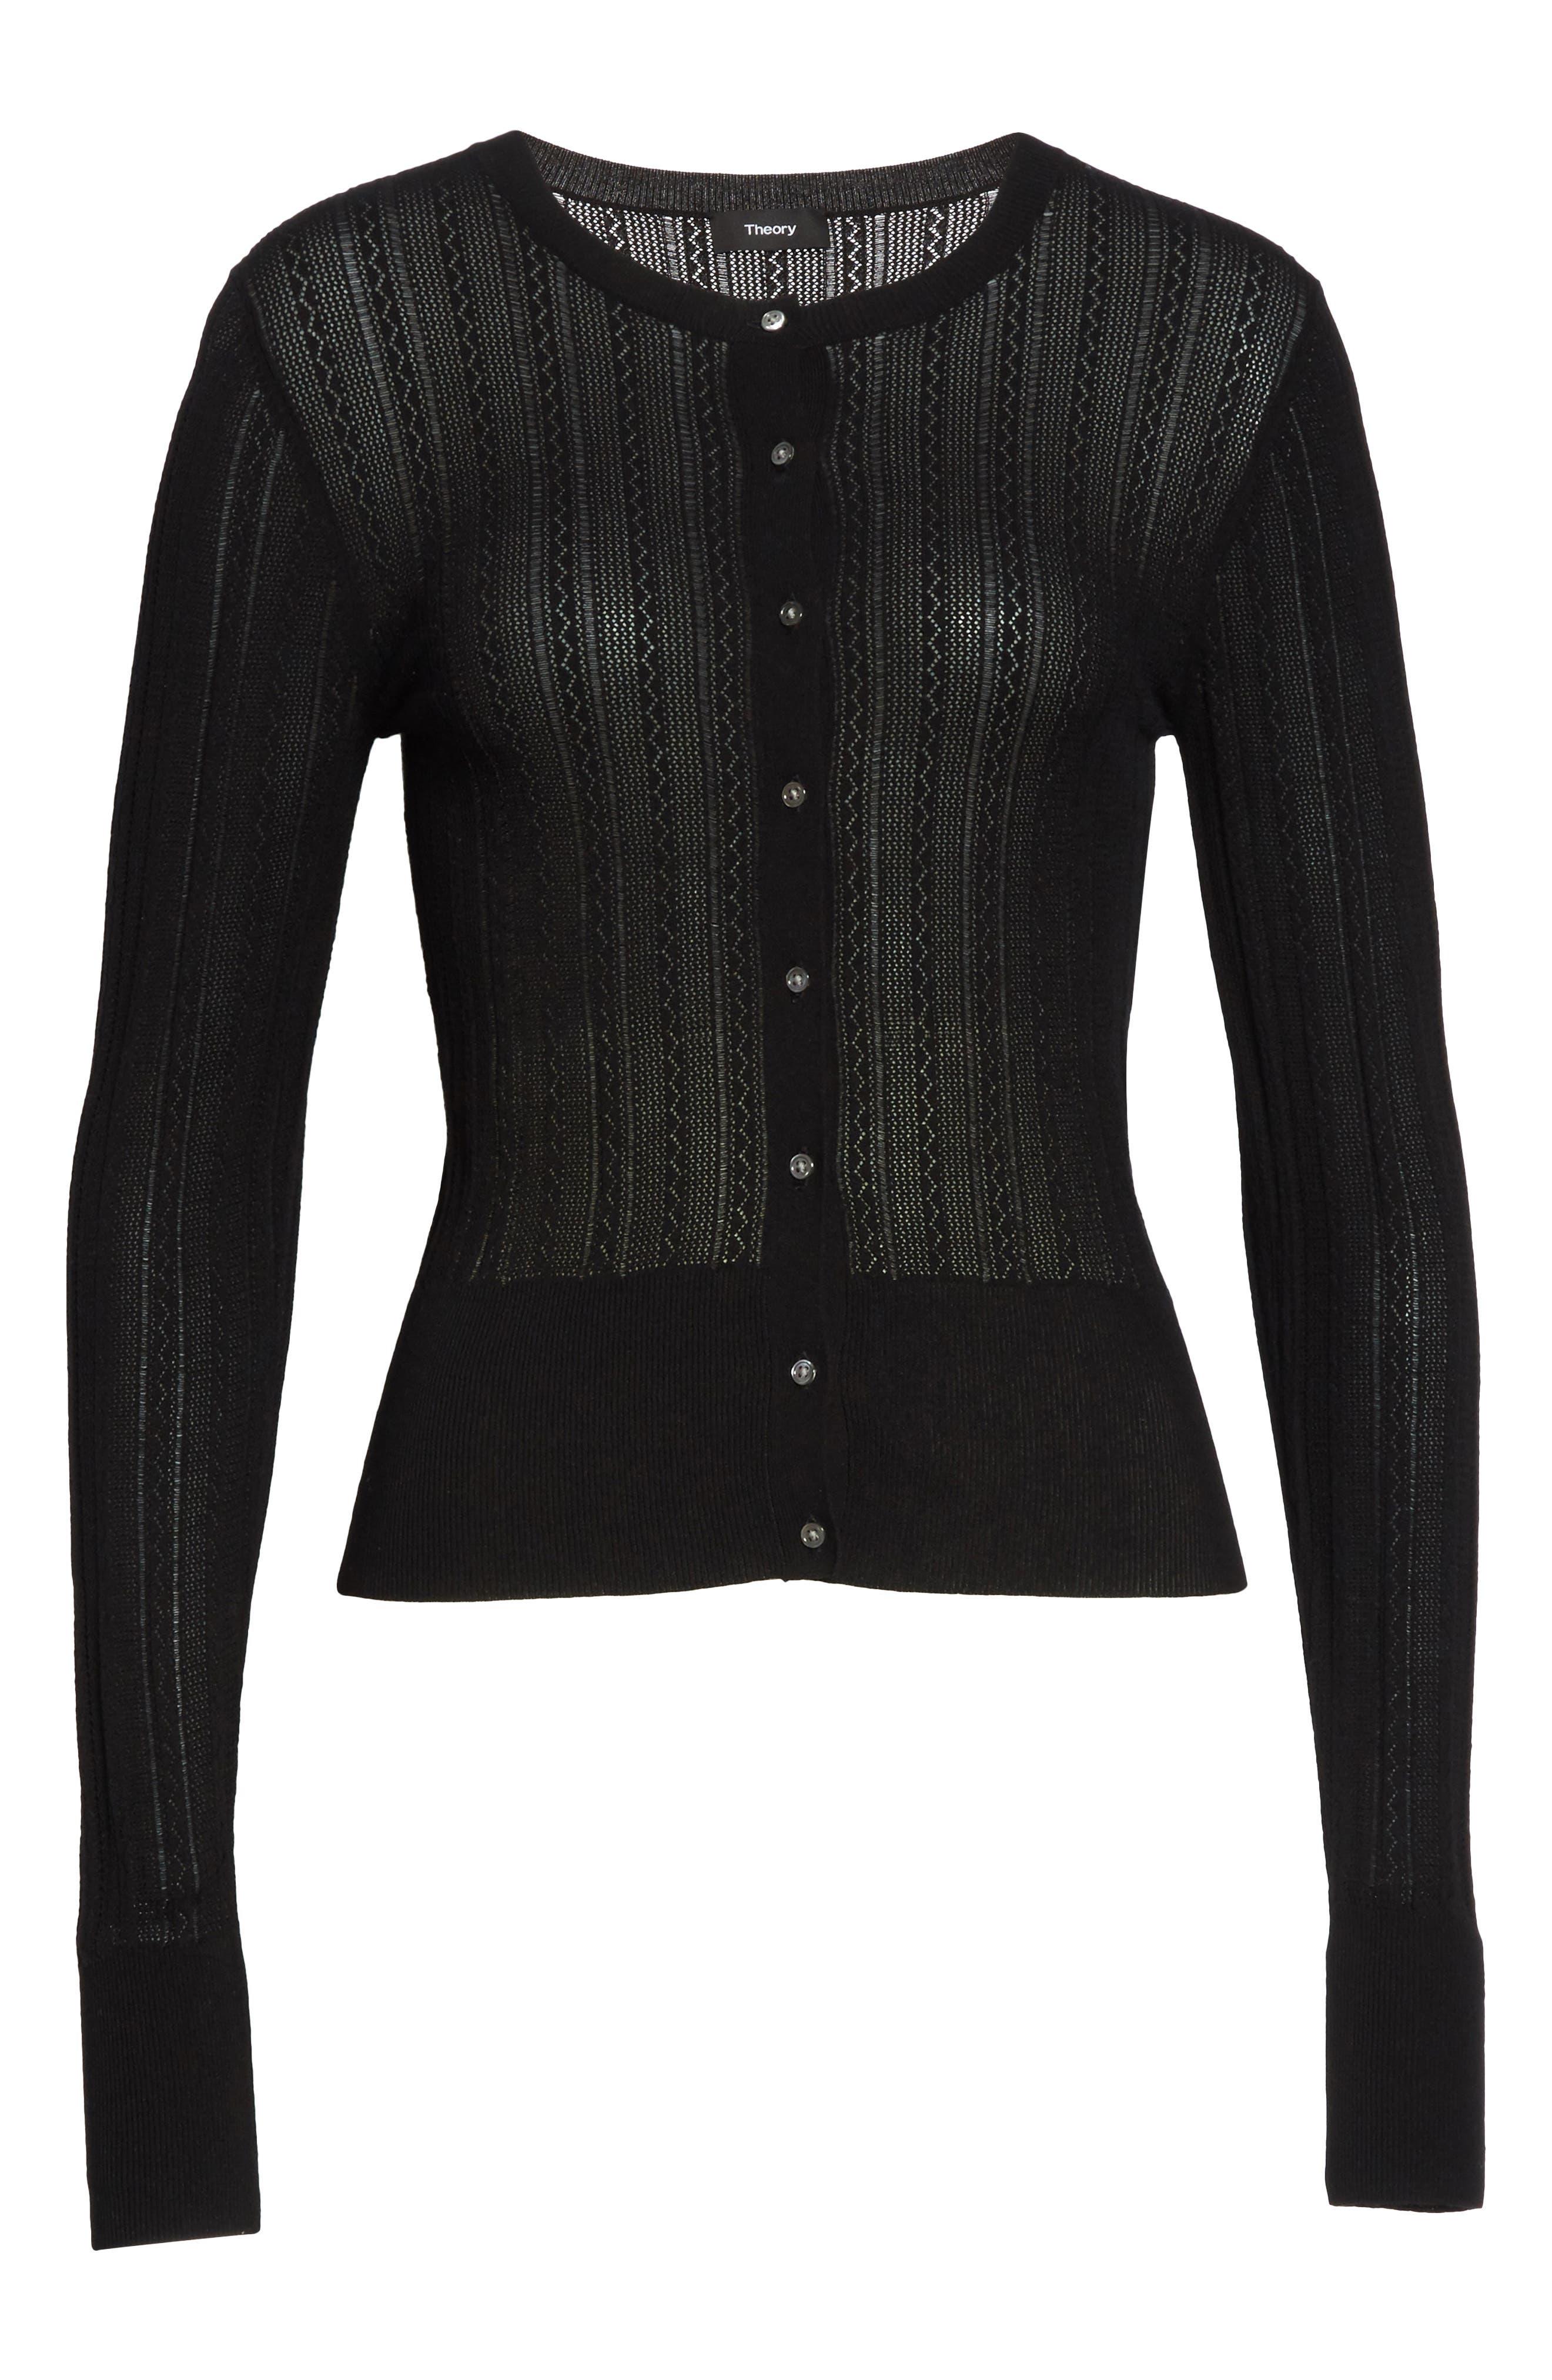 Prosecco Lace Knit Cardigan,                             Alternate thumbnail 6, color,                             Black